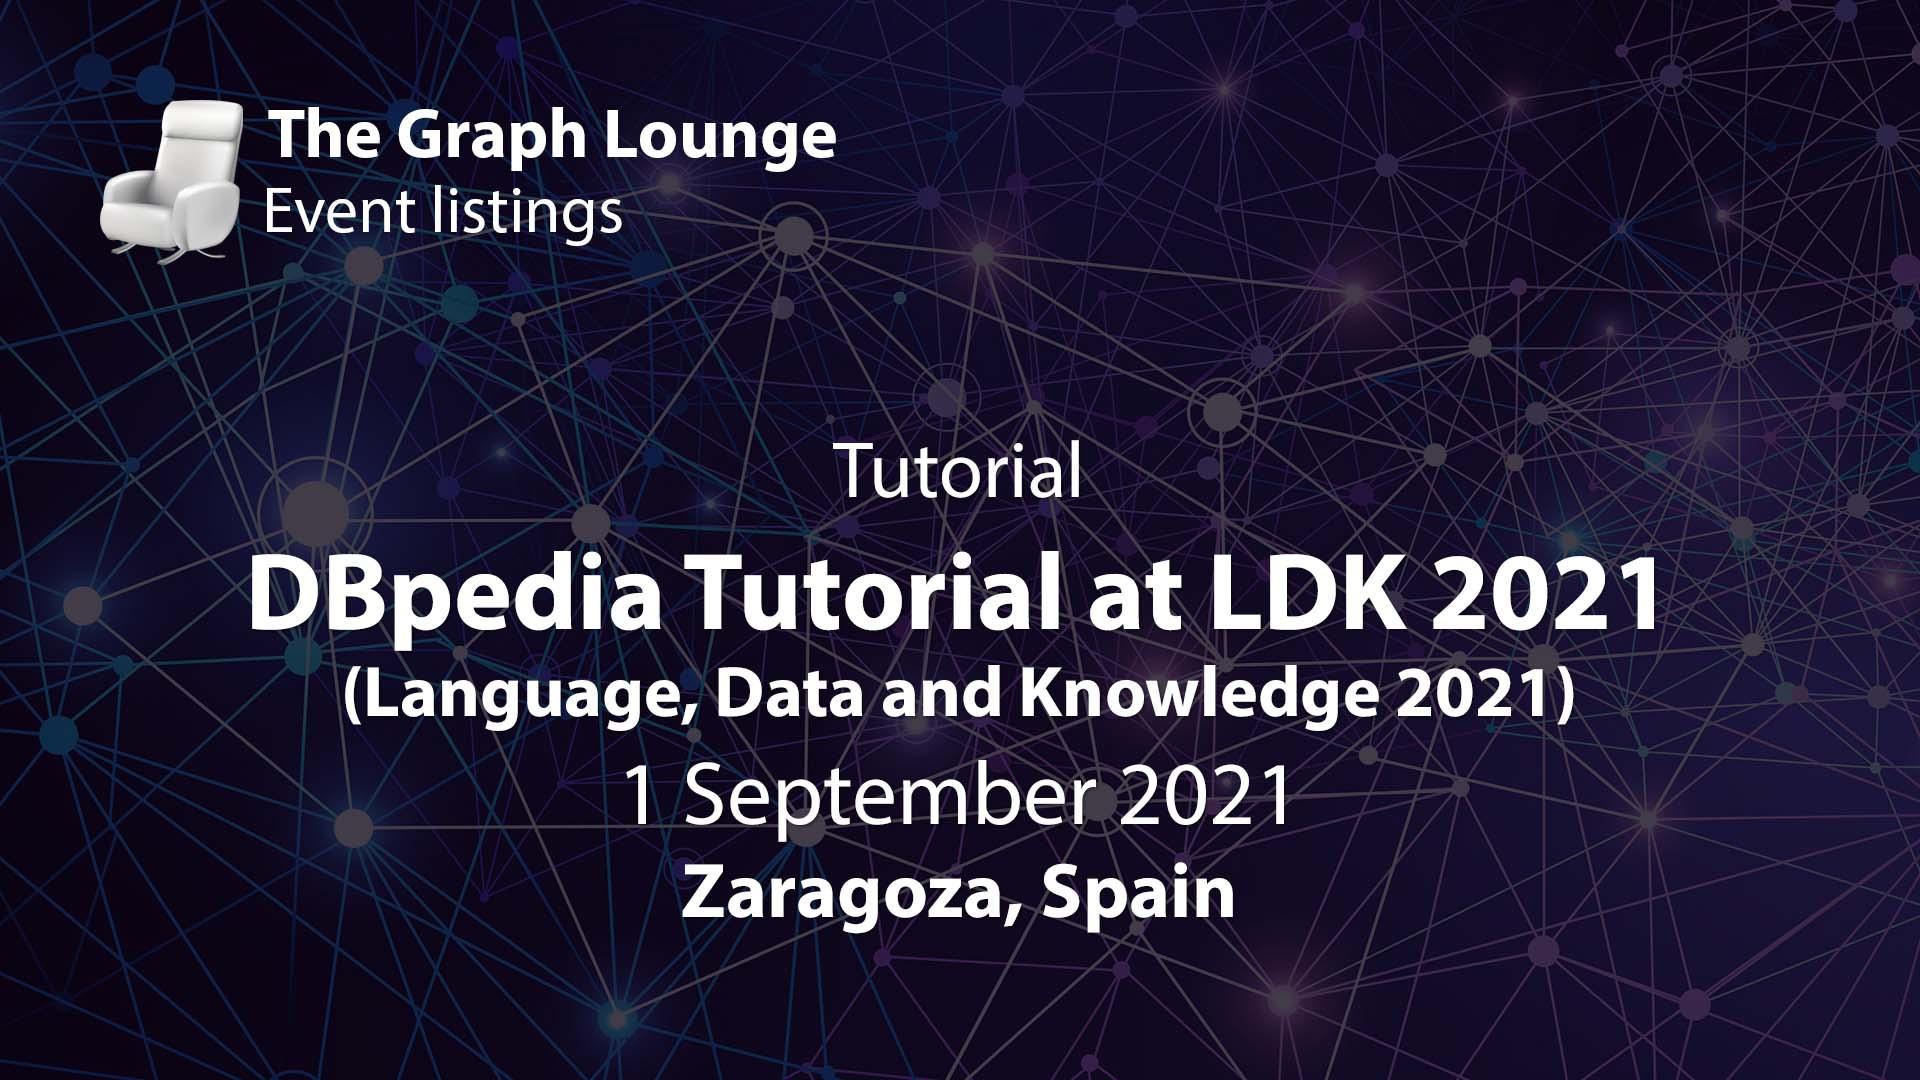 DBpedia Tutorial at LDK 2021 (Language, Data and Knowledge 2021)